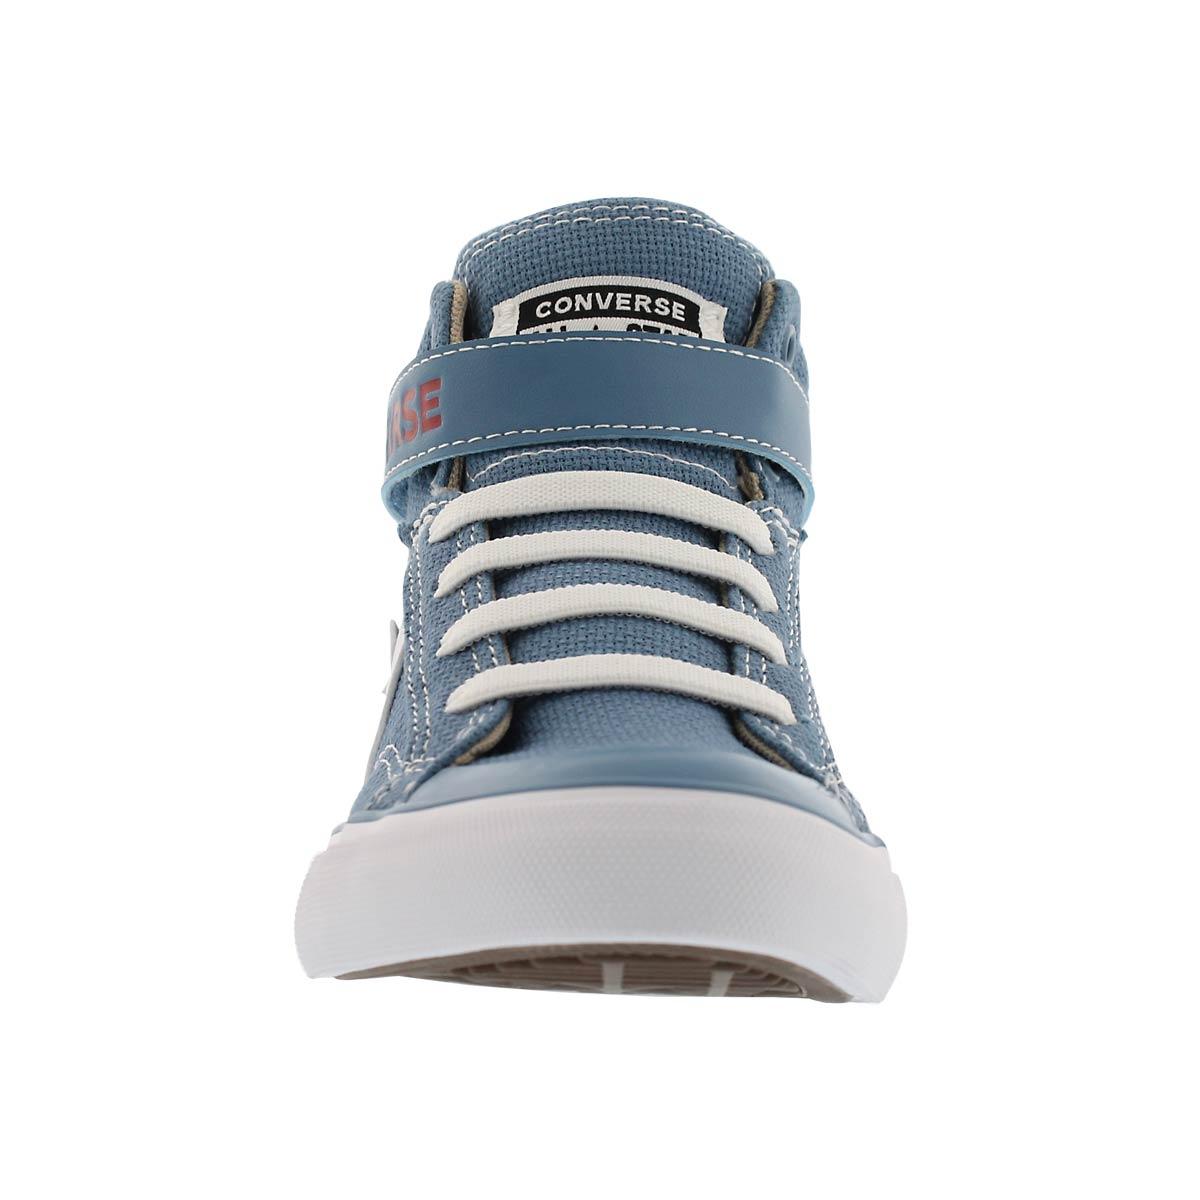 Bys Pro Blaze Strap storm hi top sneaker